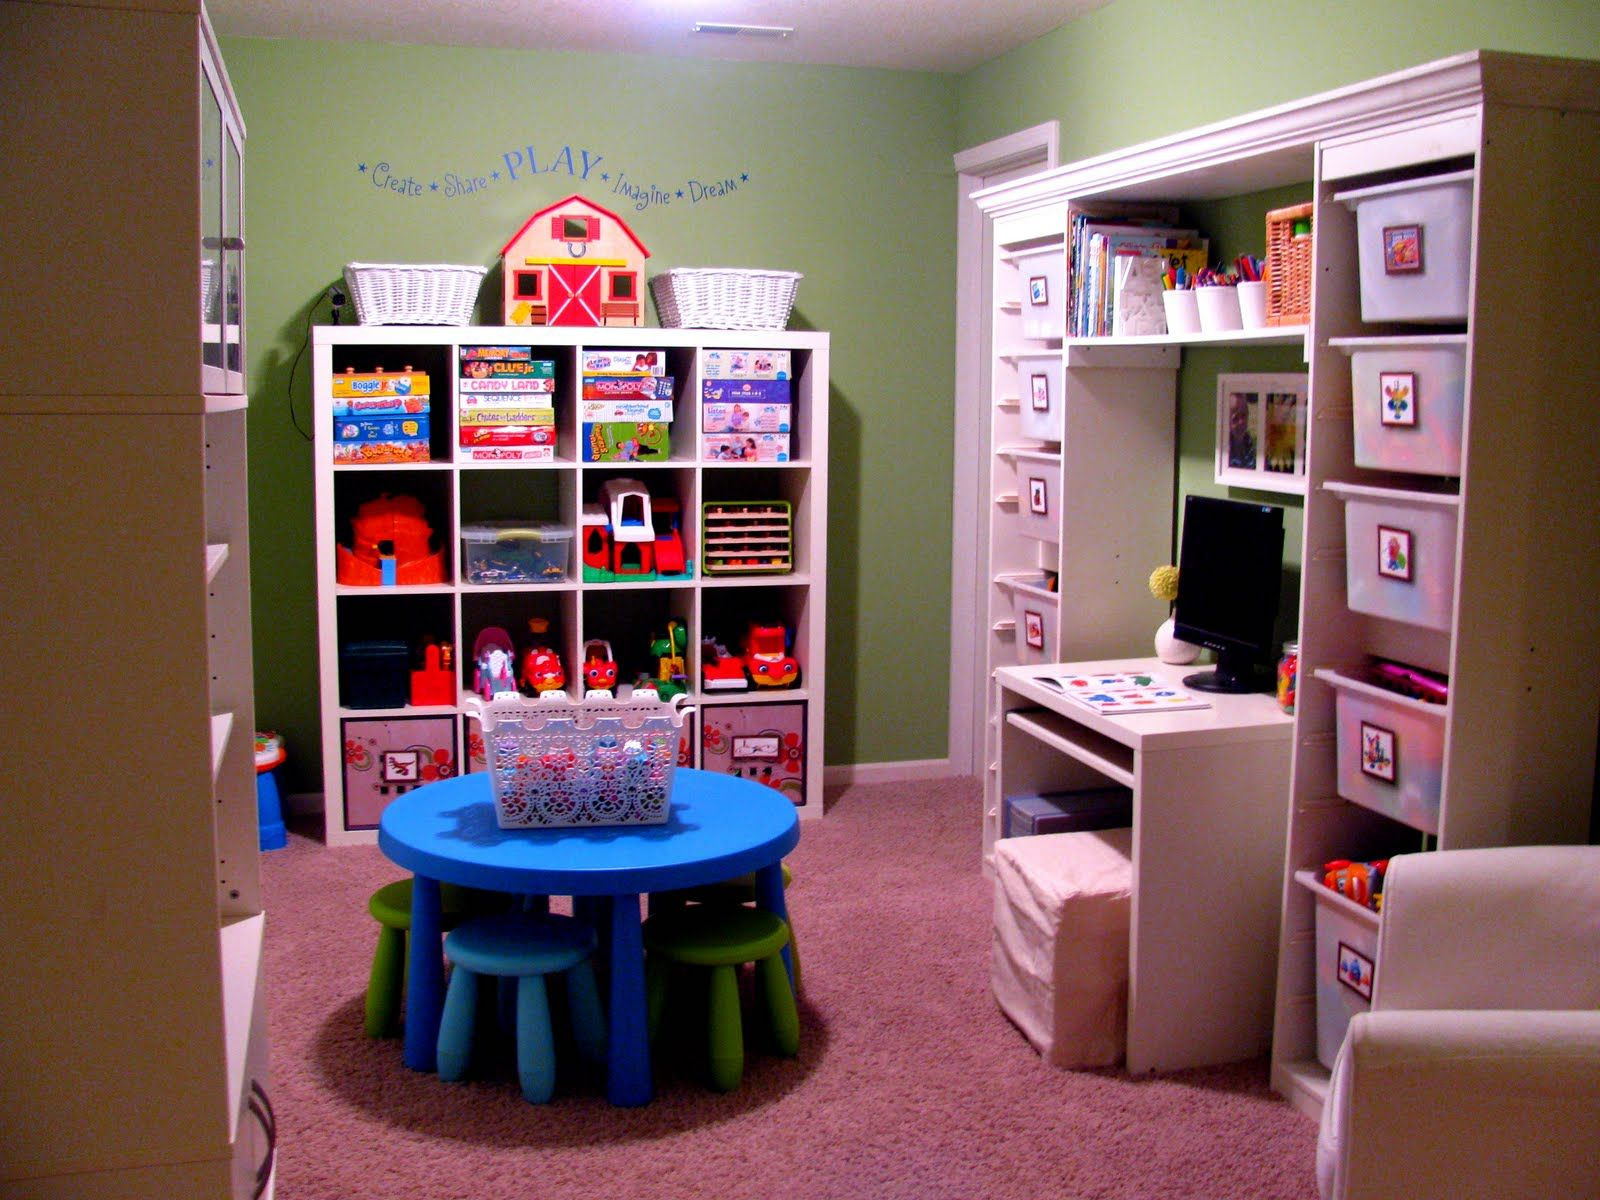 Decoration : Playroom Organization Decor Ideas Cute Playroom Decor Ideas  Playrooms For Kidsu201a Children S Playroom Ideasu201a Kids Play Room Ideas Also ...